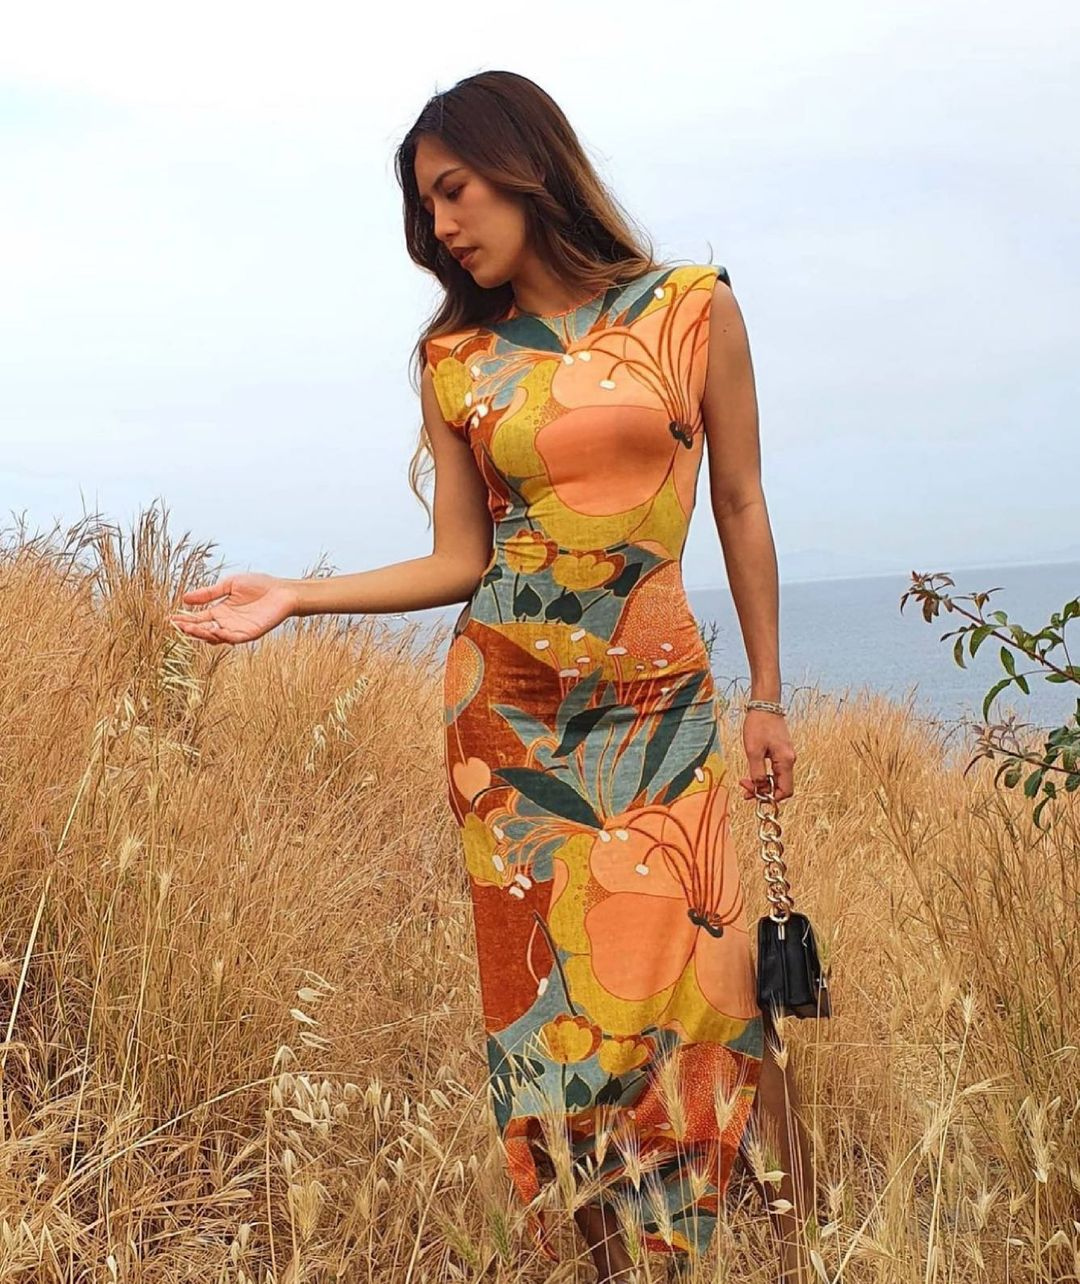 printed dress with cut-out detail de Zara sur zara.style.daily